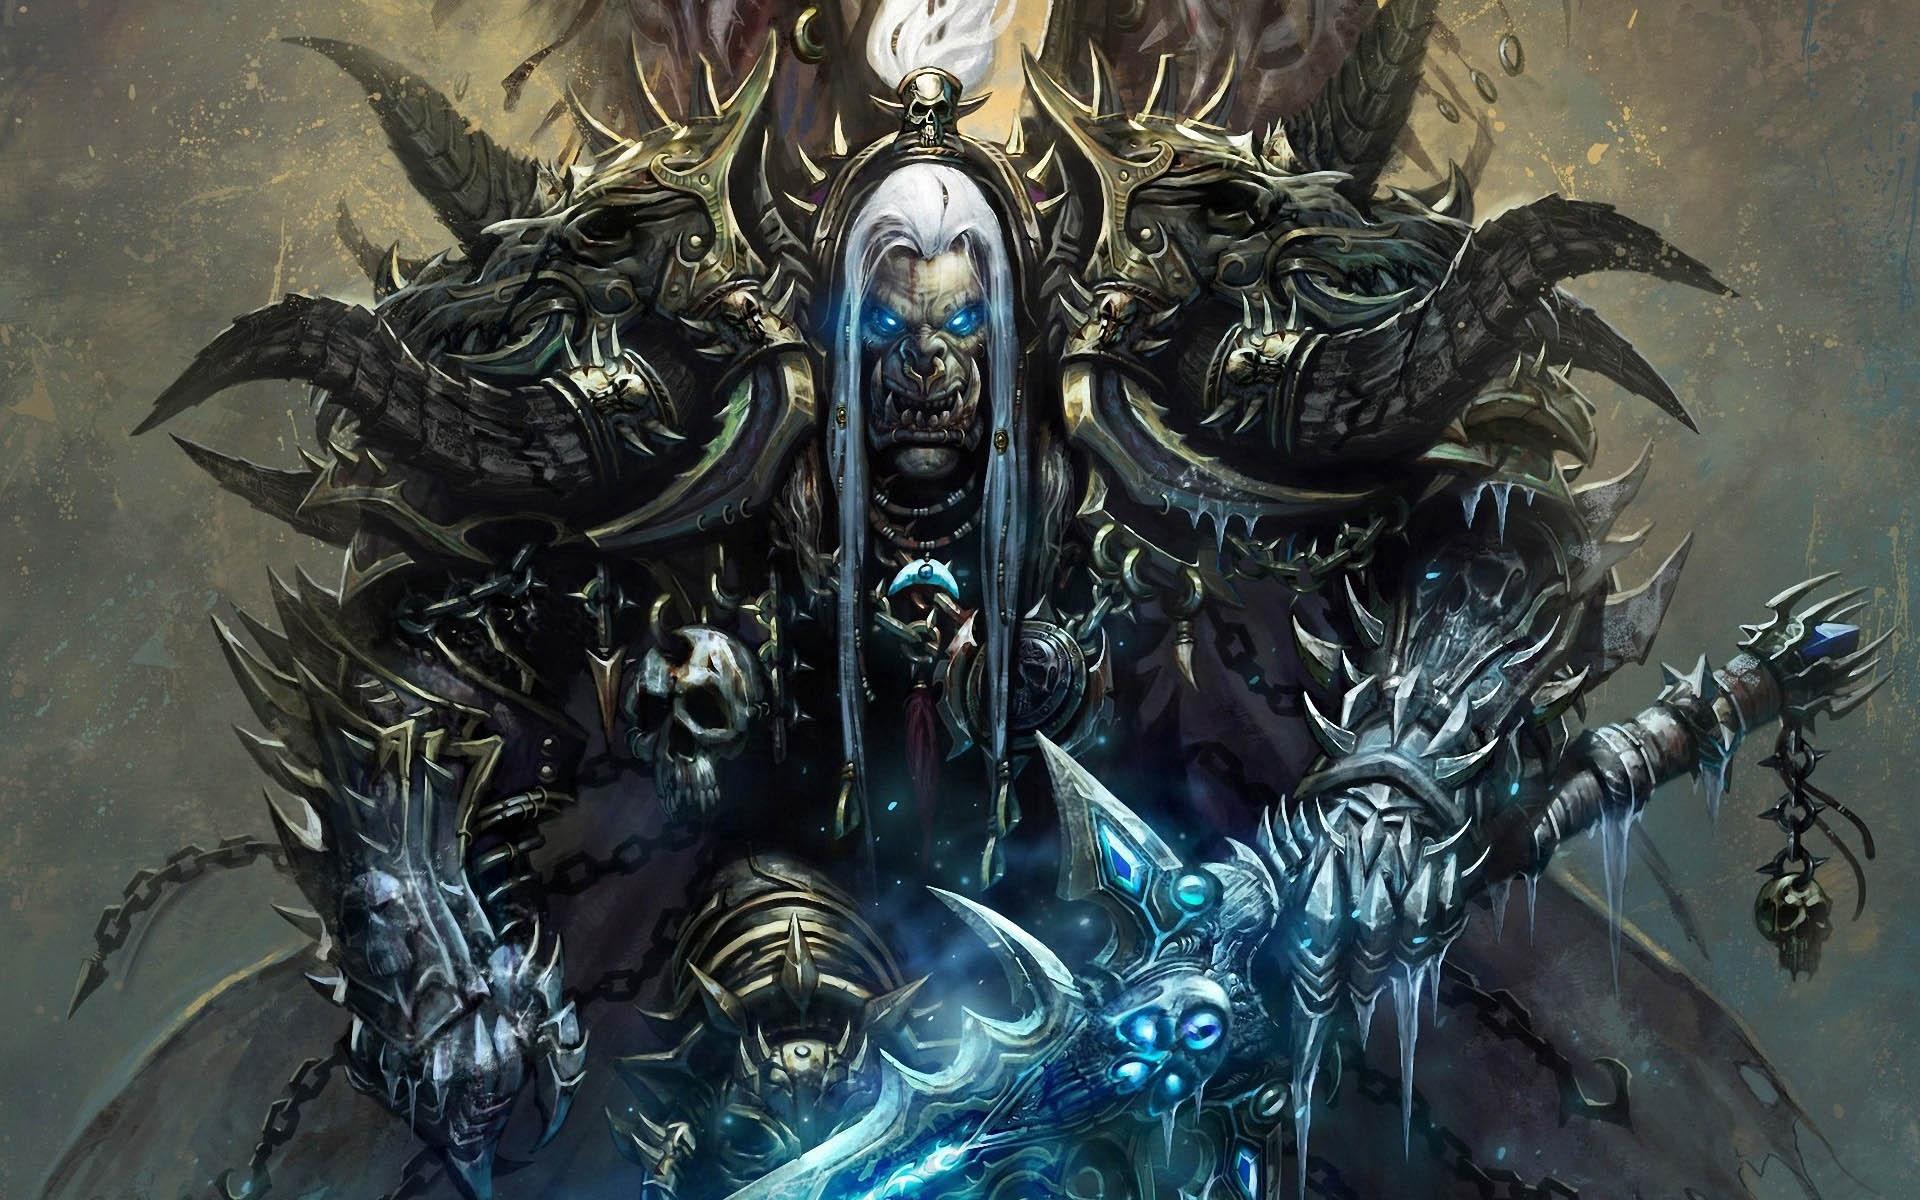 Warcraft Orc Knight Warrior Sword Wow Armor   Stock Photos 1920x1200